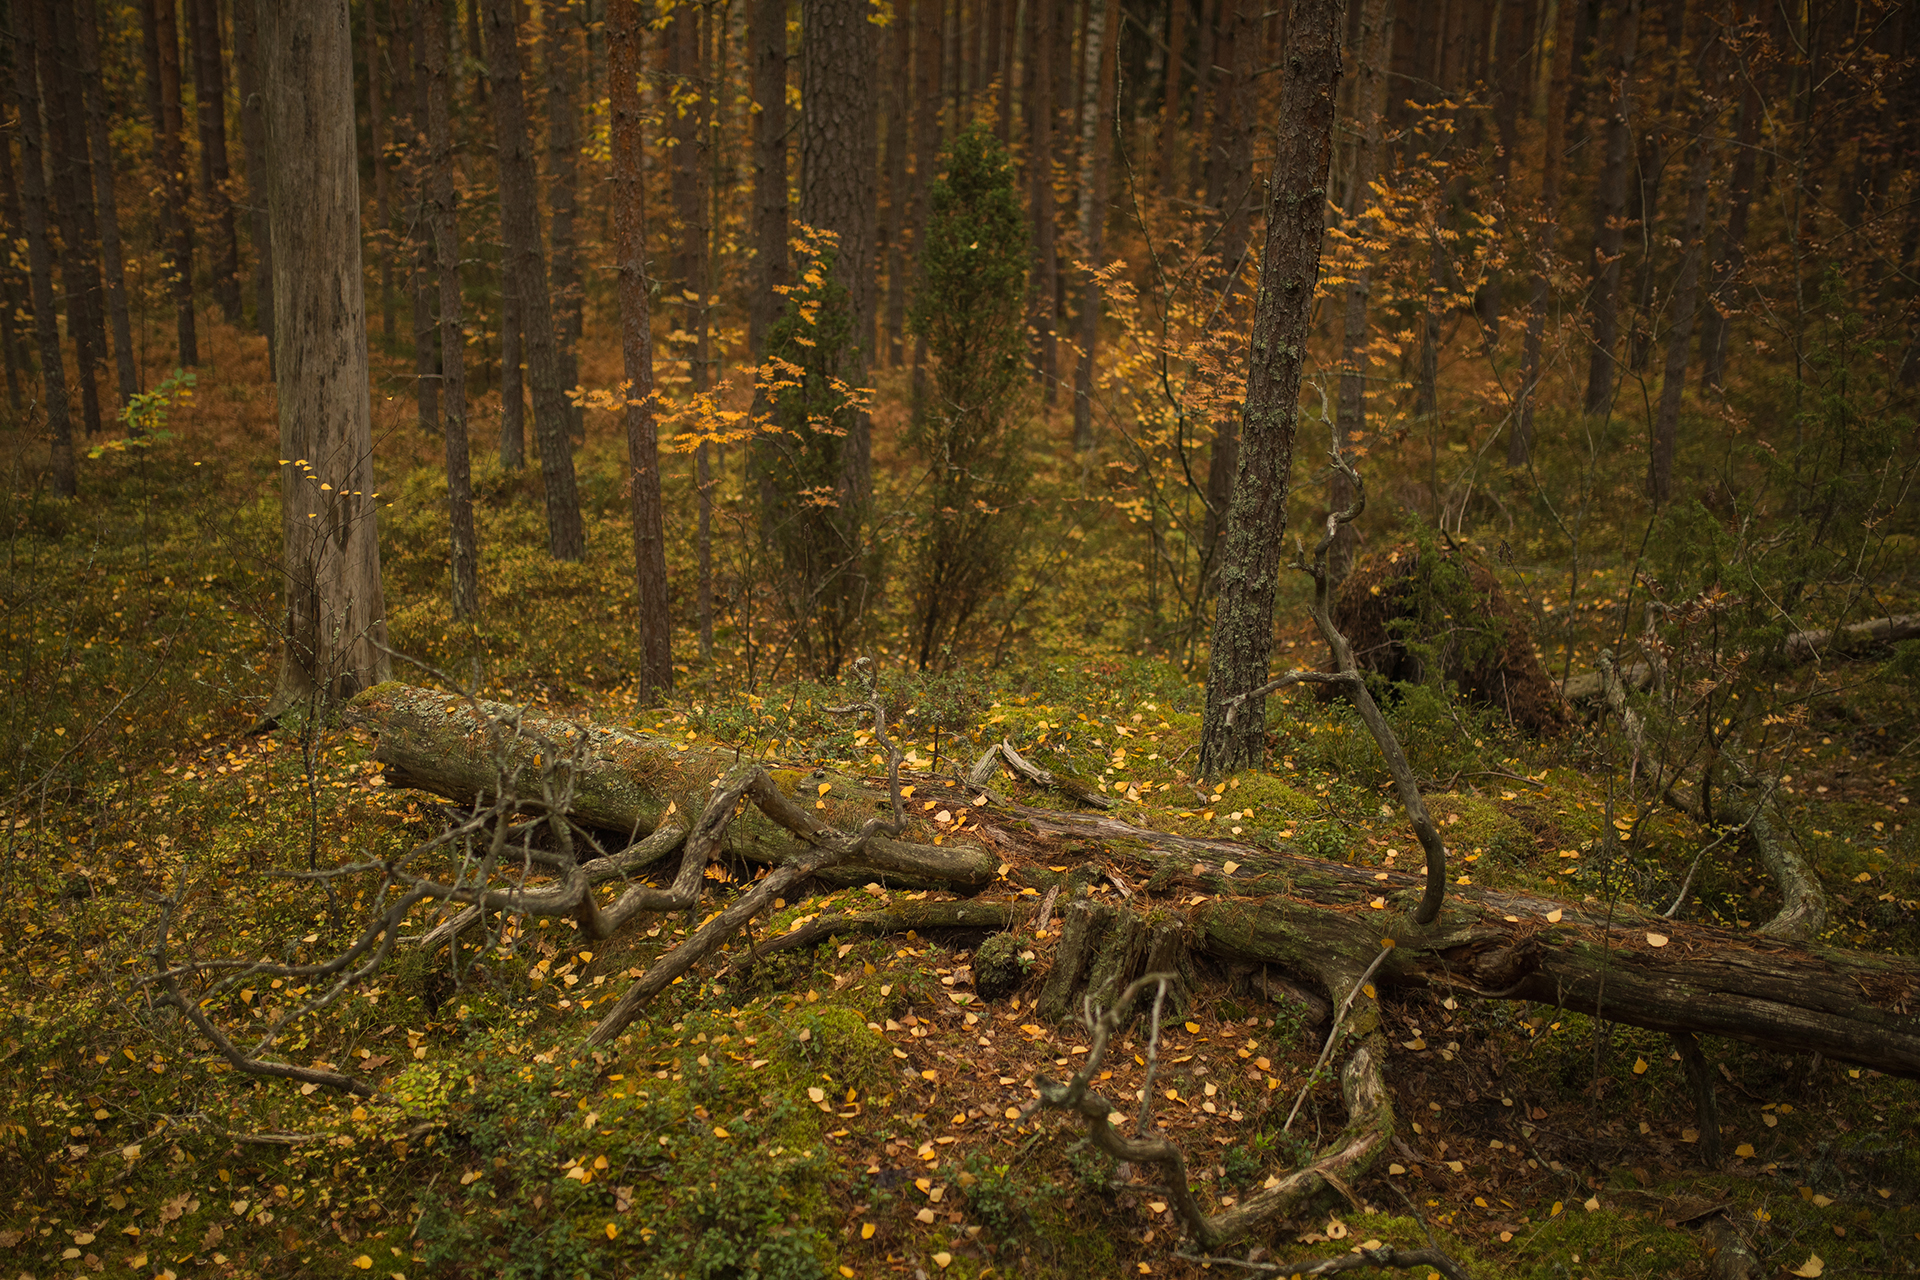 Autumn landscape / Photo: A. Kuusela